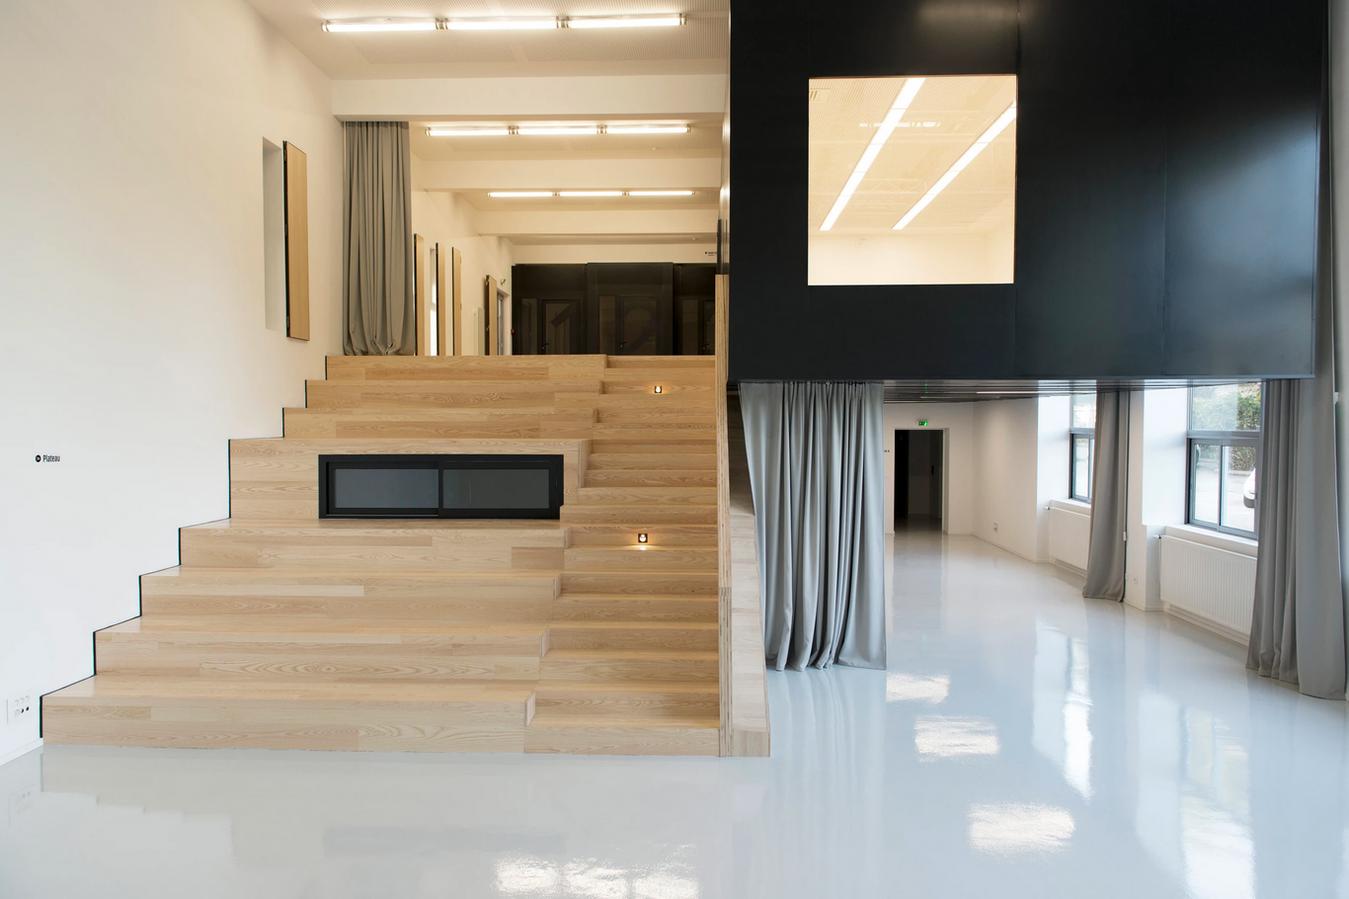 Frutsoso-architecte-load-5.png